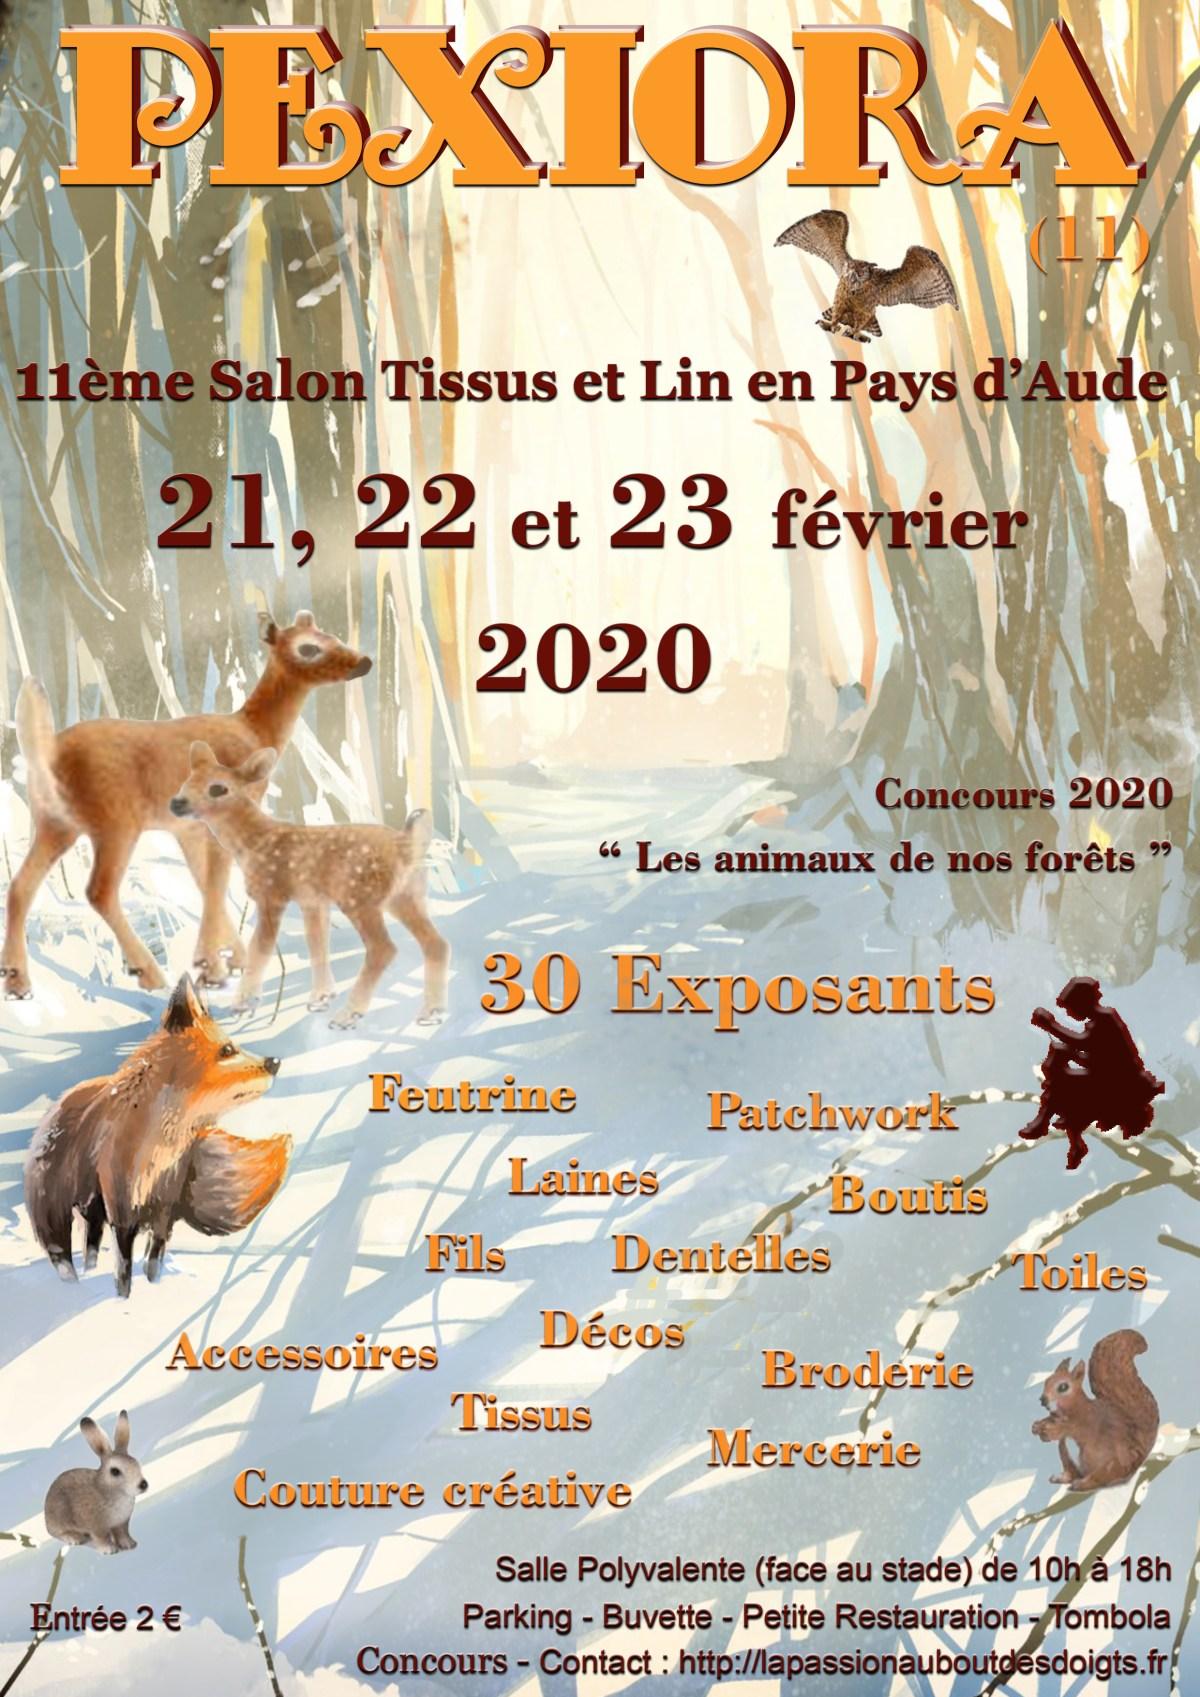 Affiche-Pexiora-salon-février-2020